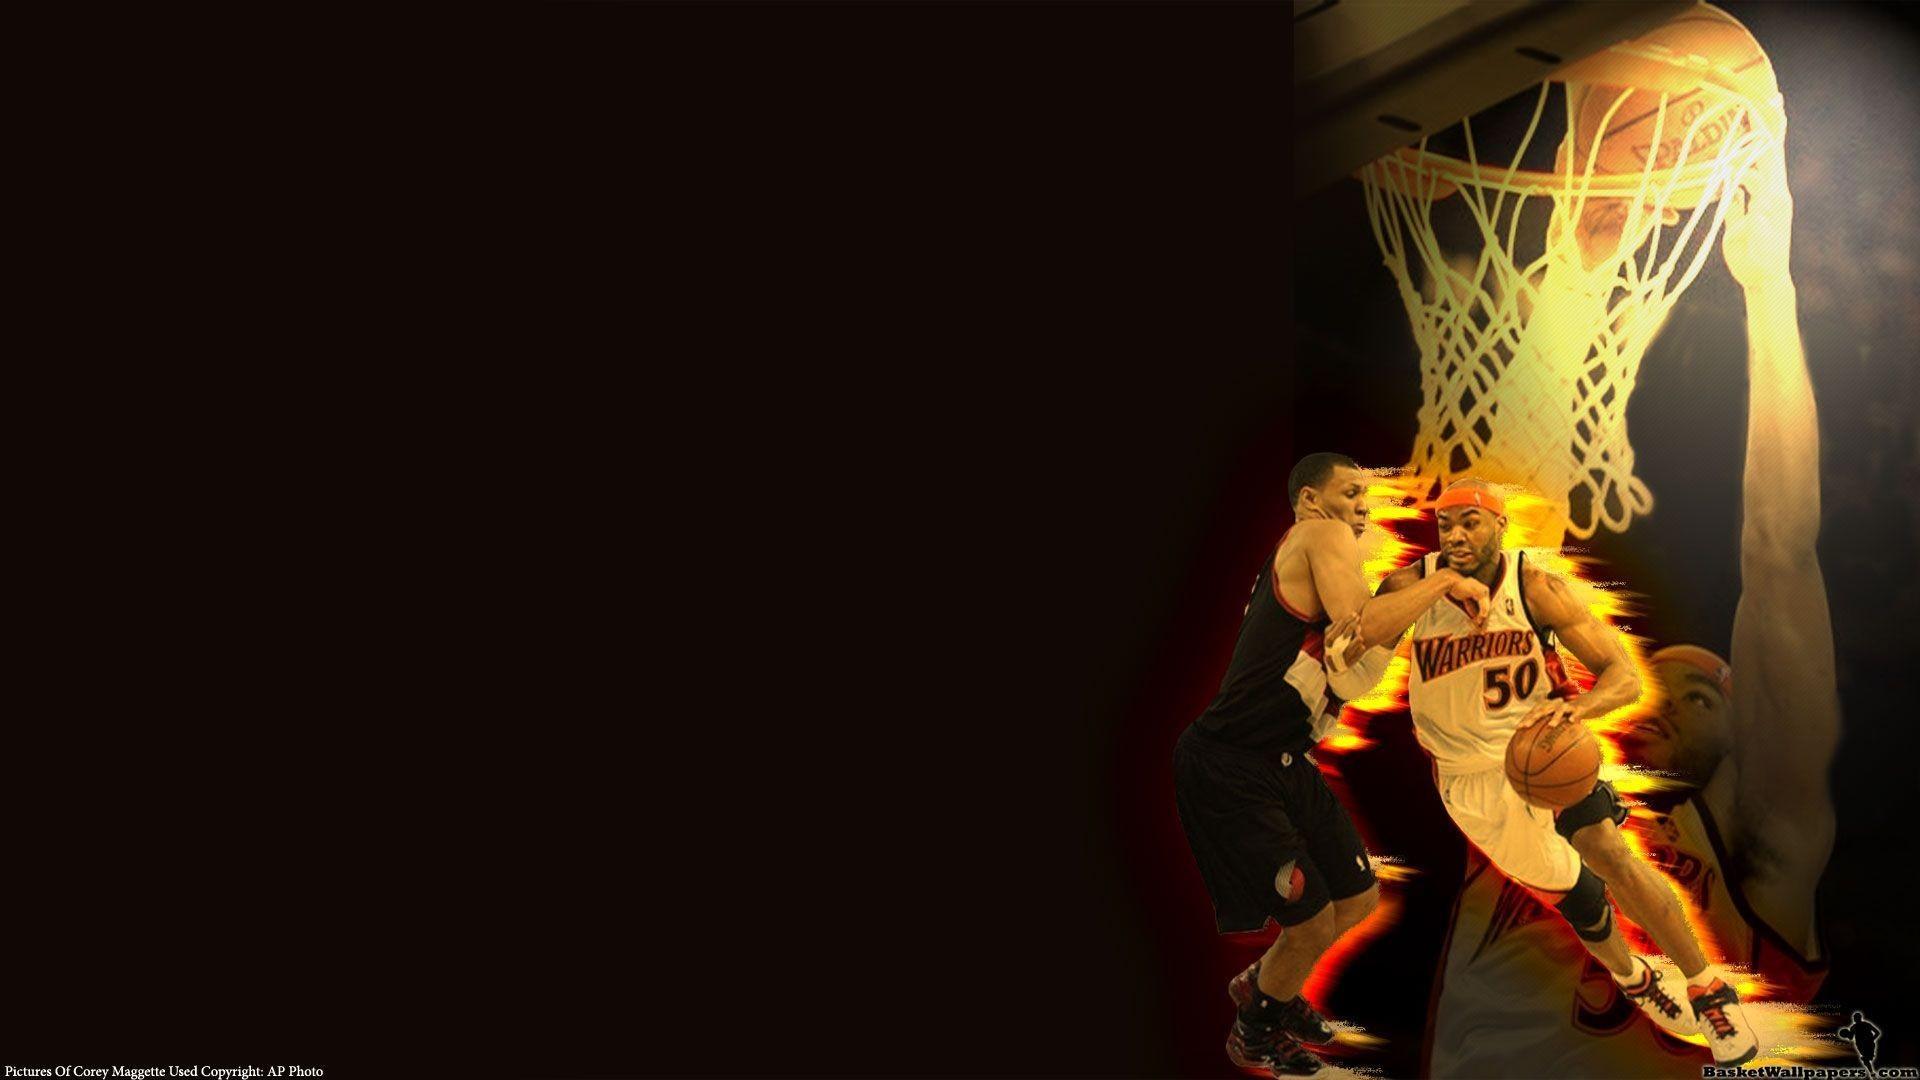 Res: 1920x1080, Basketball Wallpaper HD | Ainuna.com